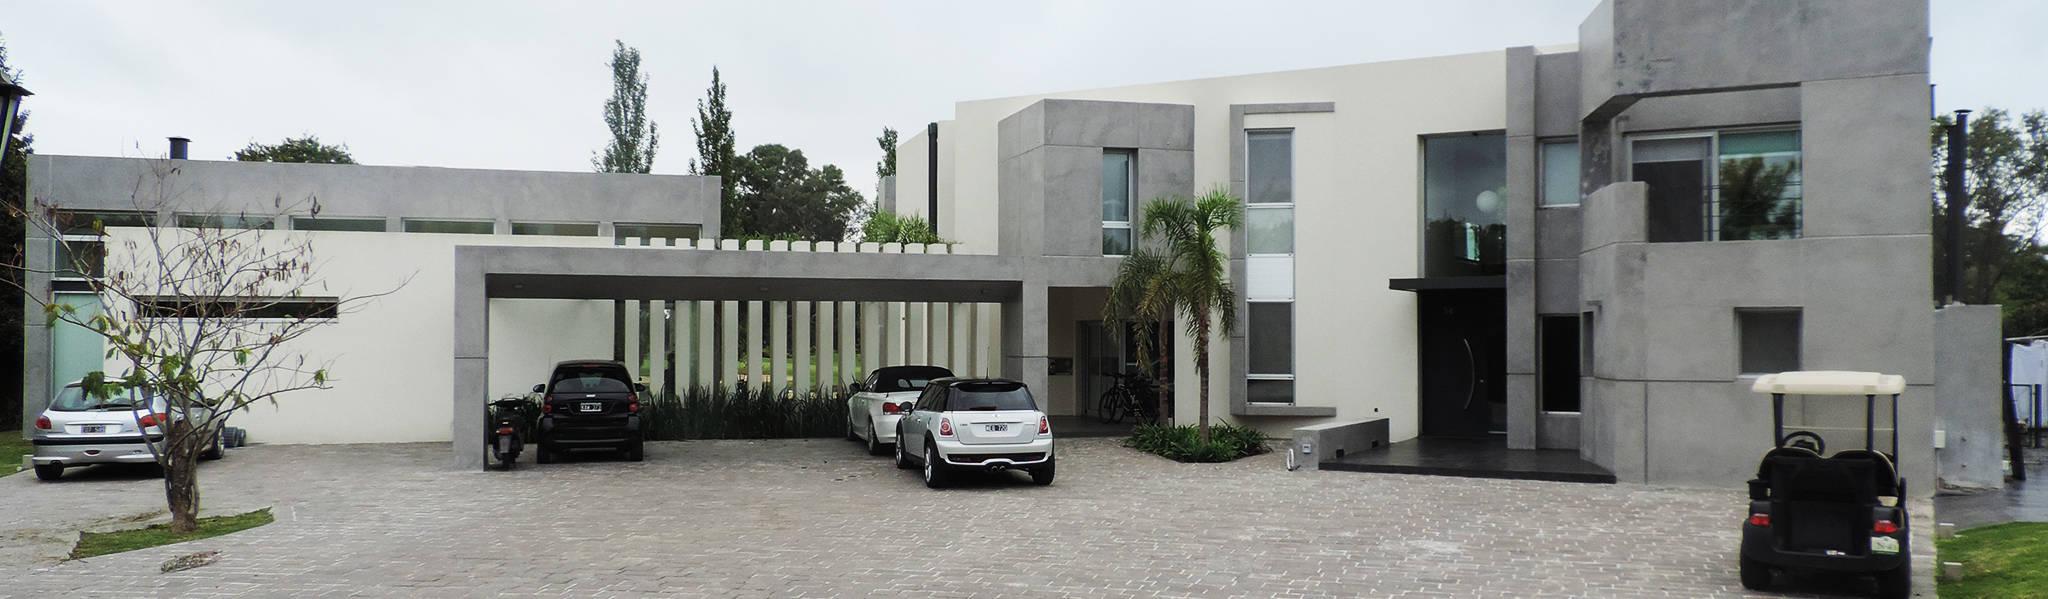 de Jauregui Salas arquitectos